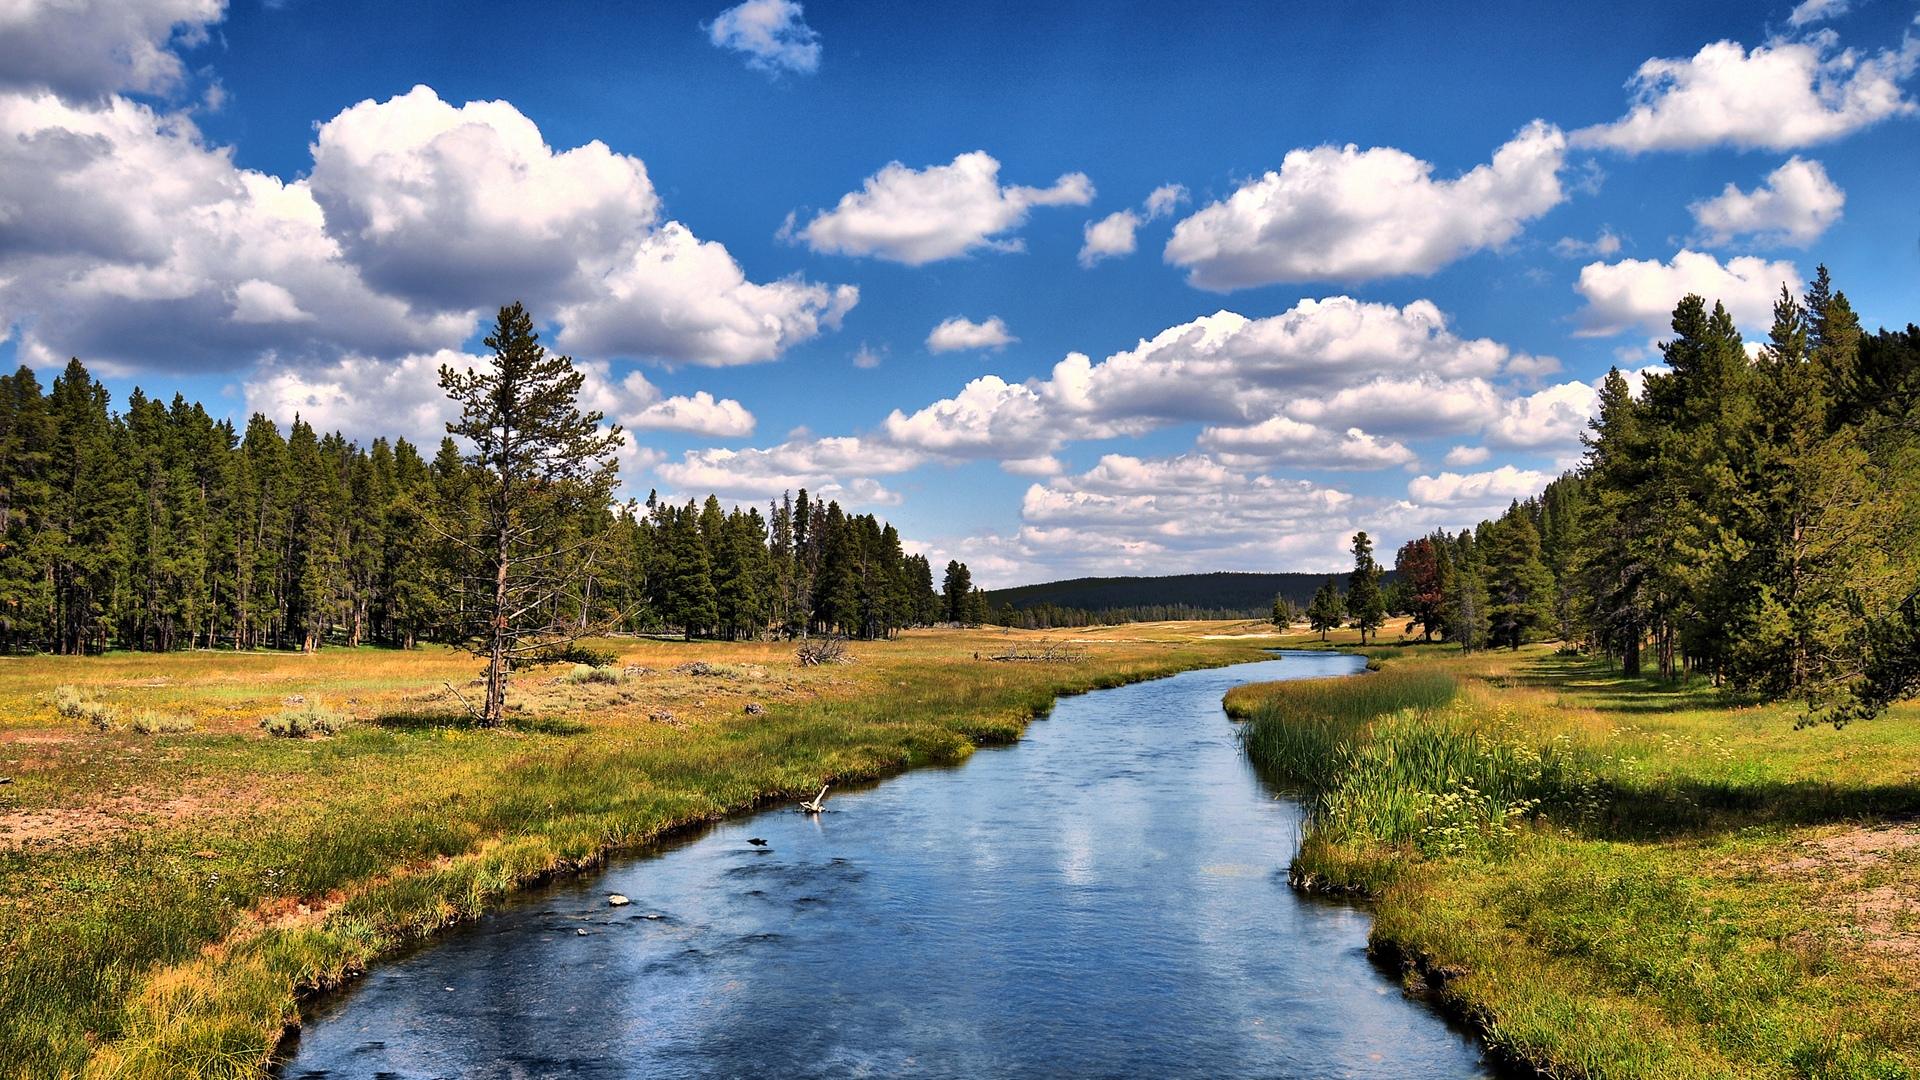 Creek Backgrounds